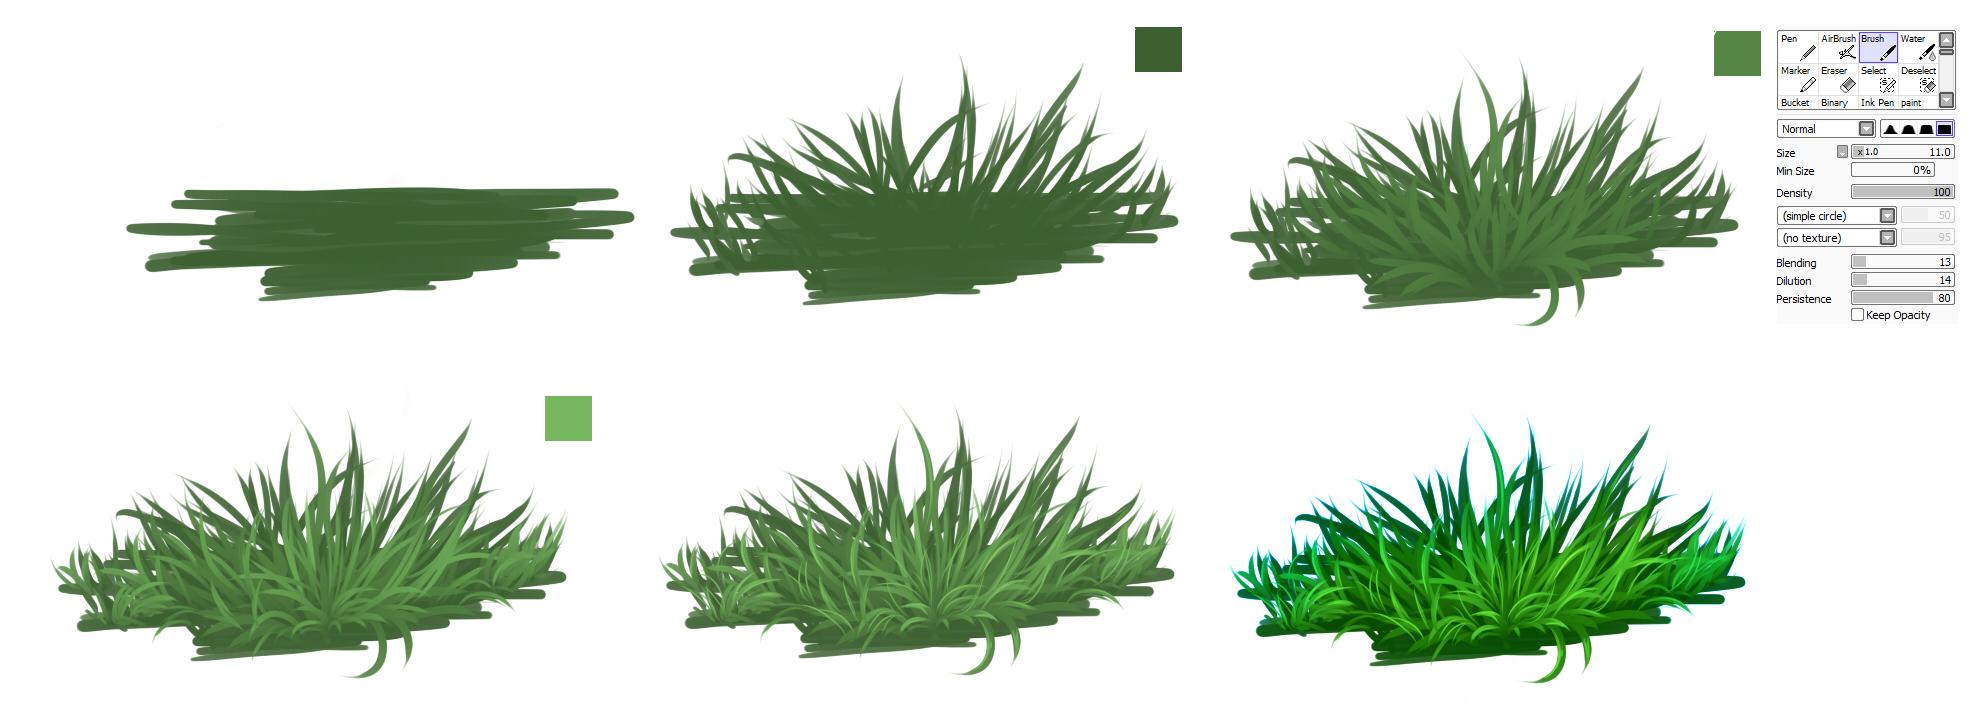 GRASS - easy tutorial by ryky on DeviantArt